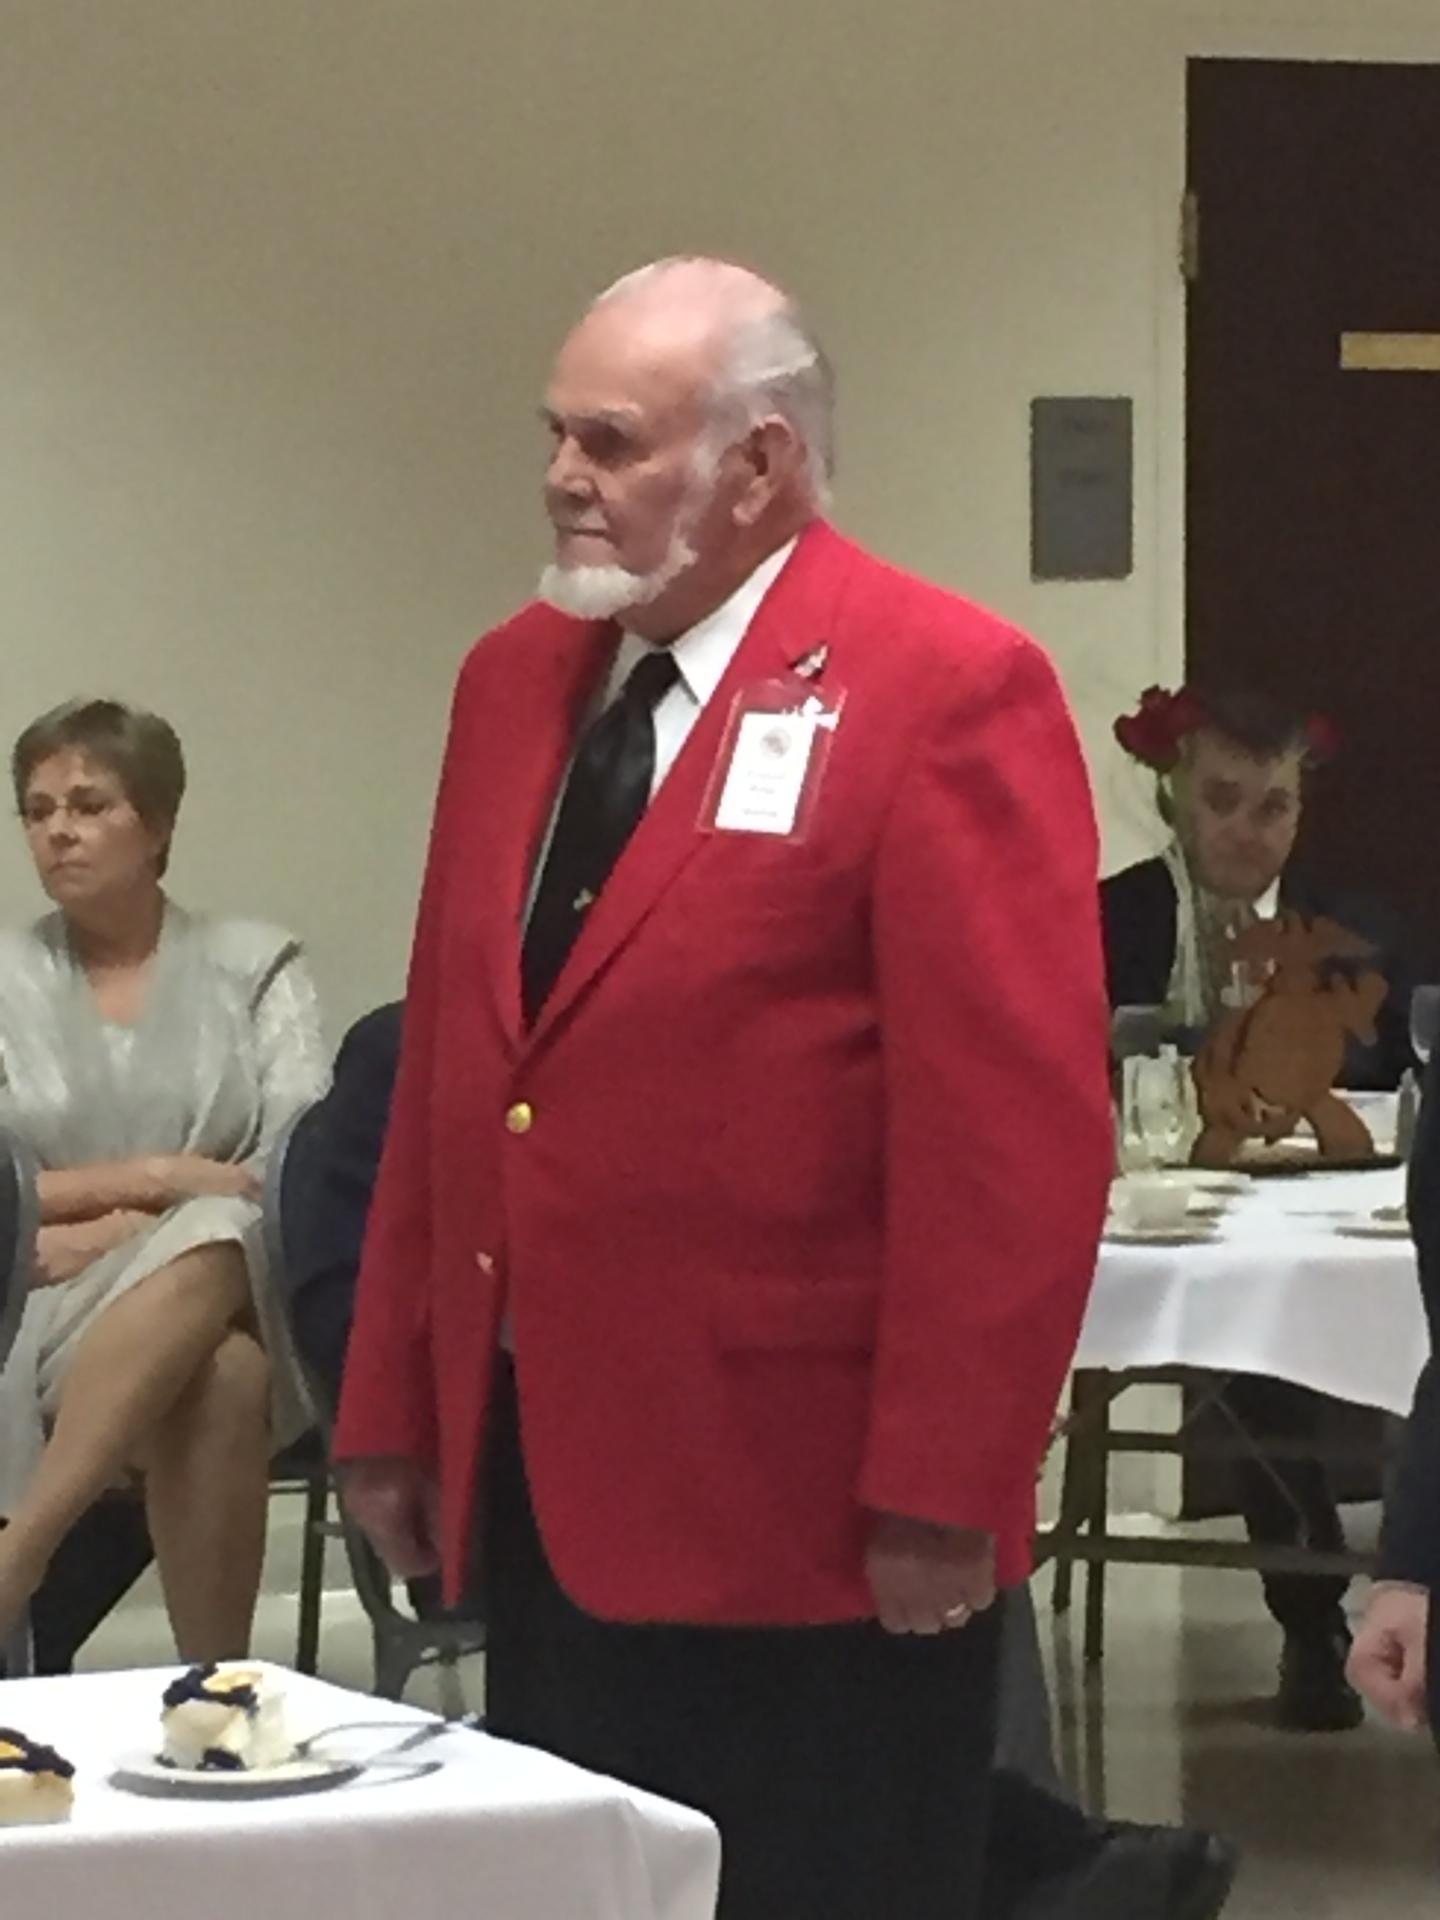 Kenneth Rains Old Marine Present